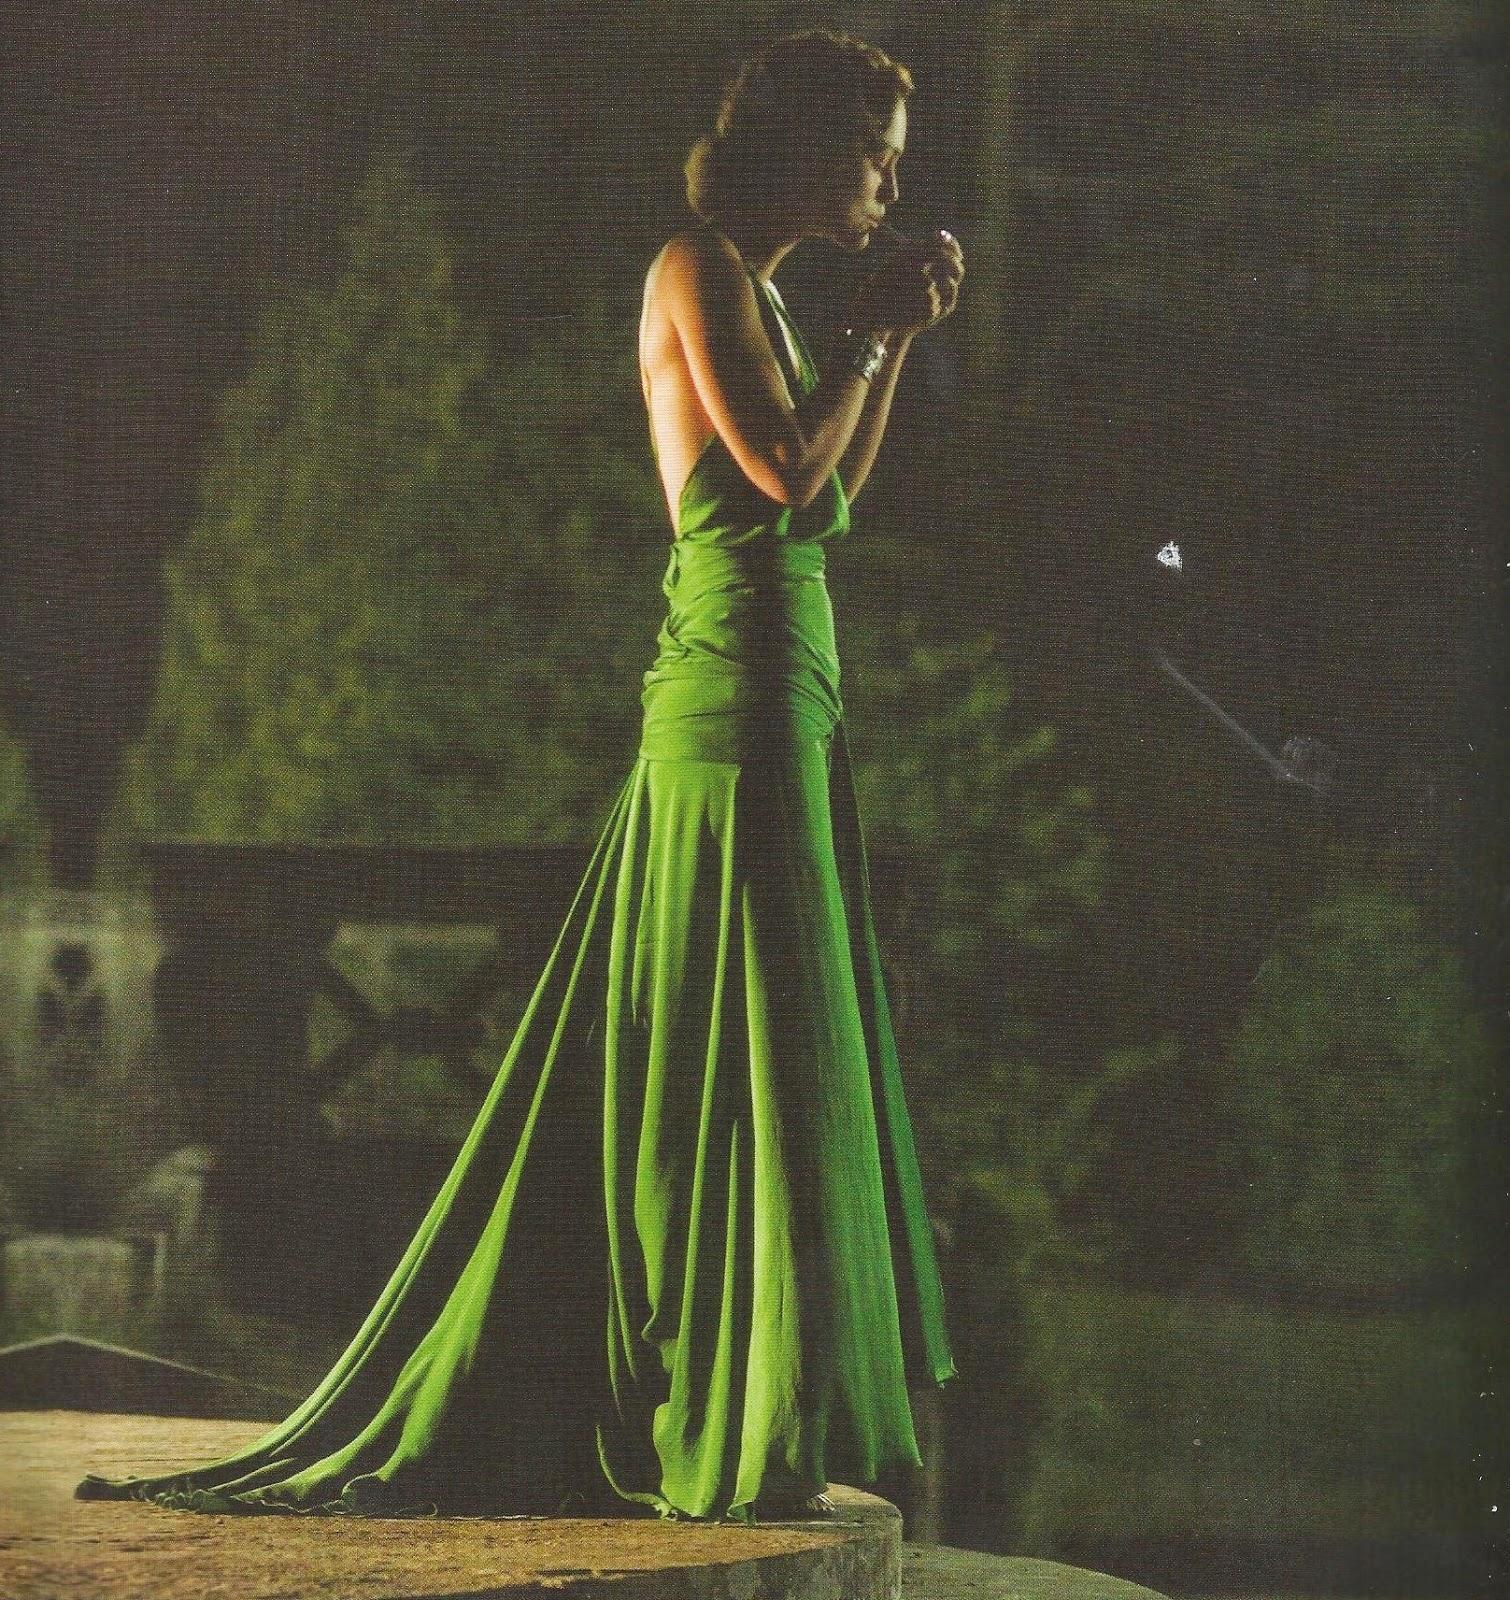 http://2.bp.blogspot.com/-ZwNeNkG9gD8/UO8Ct0Yv_HI/AAAAAAAAA3s/sbQyOWvEslA/s1600/robe+soie+emeraude+Keira+Knightley.jpg